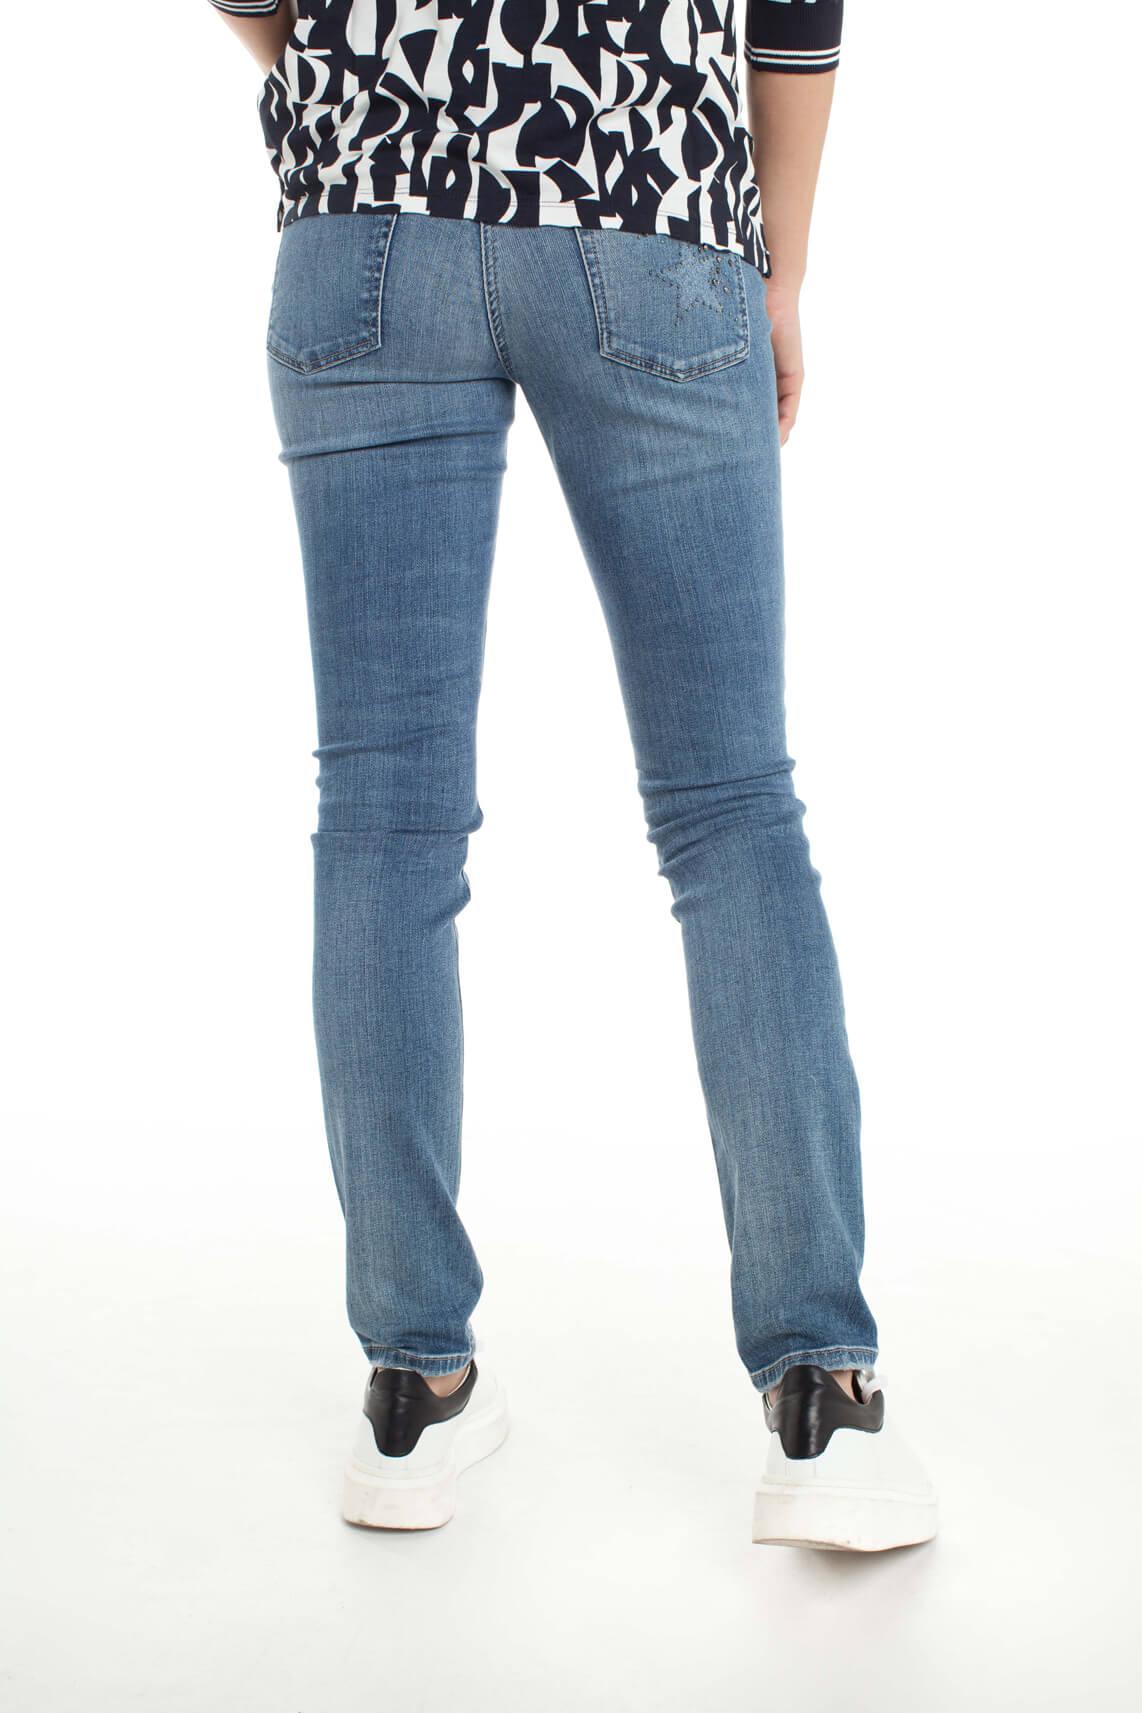 Cambio Dames Parla jeans met studs Blauw